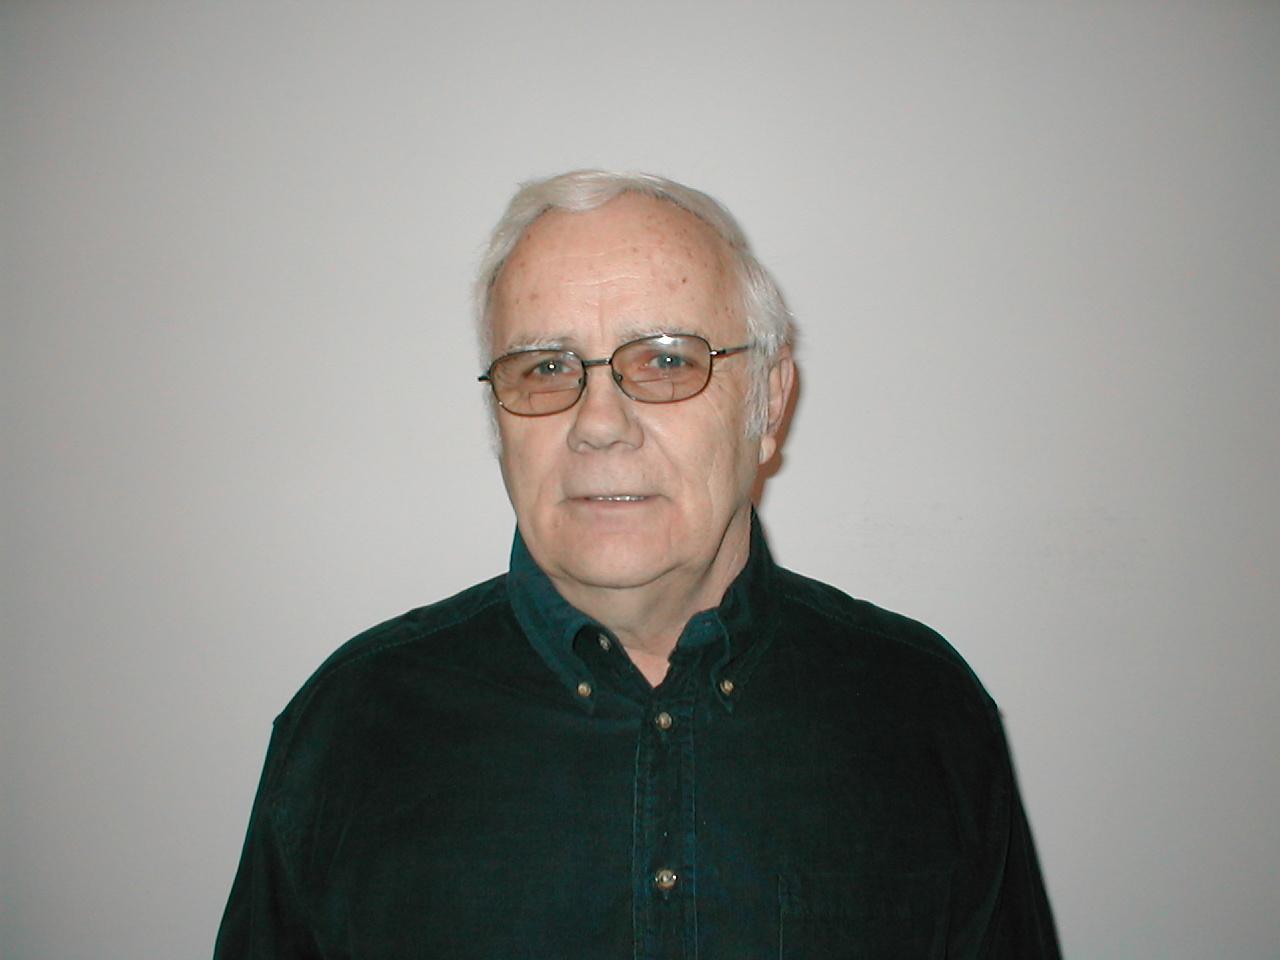 Bill Geukes